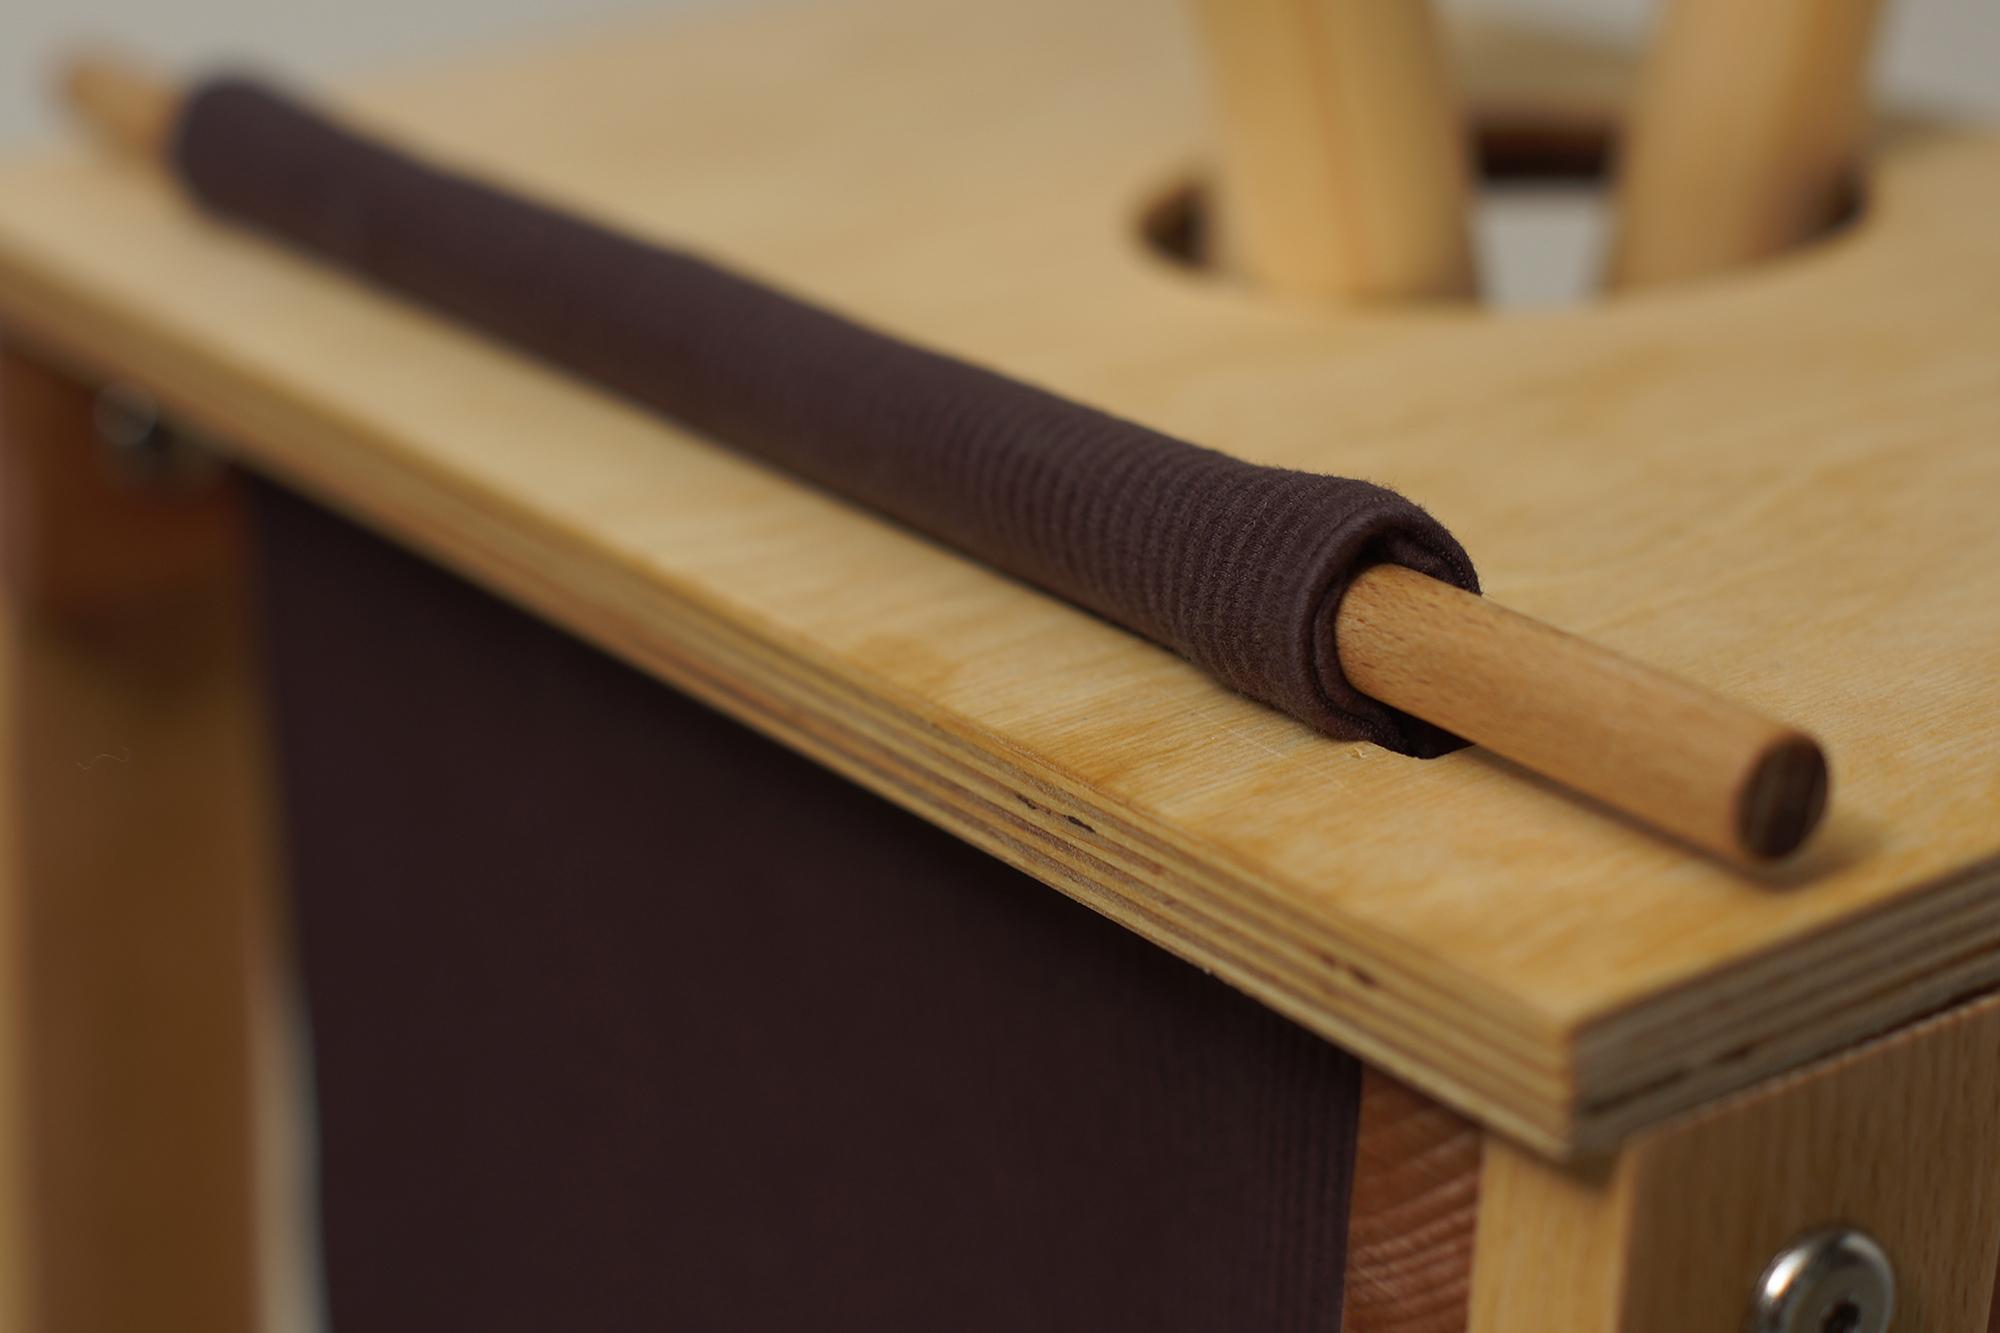 Dezső Ilona - Download Design - Bench with hanger 03.jpg